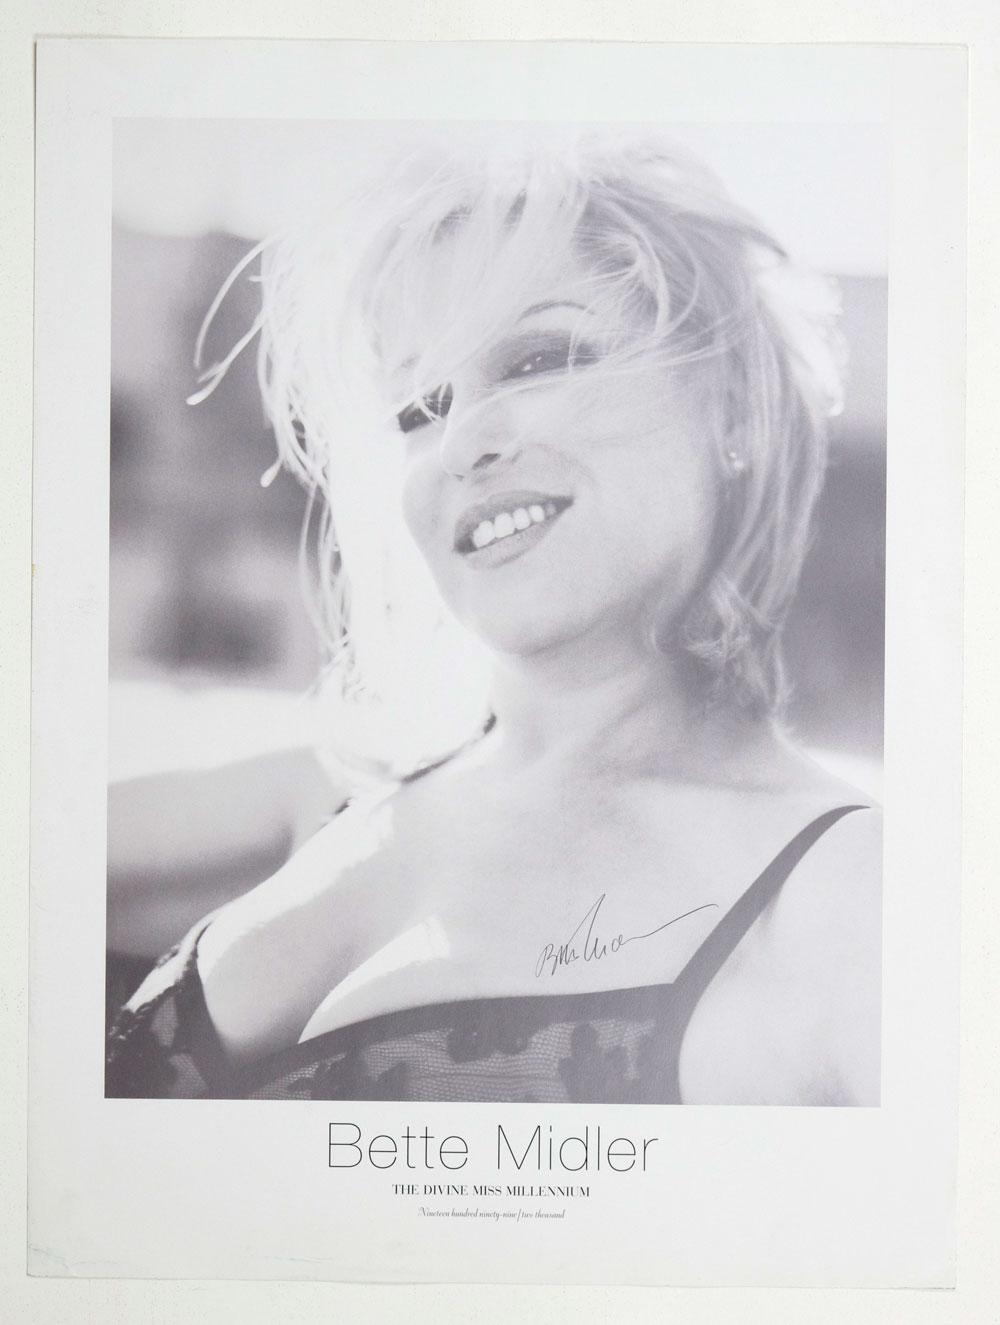 Bette Midler Poster 1999 The Devine Miss Millenium tour 18 x 24